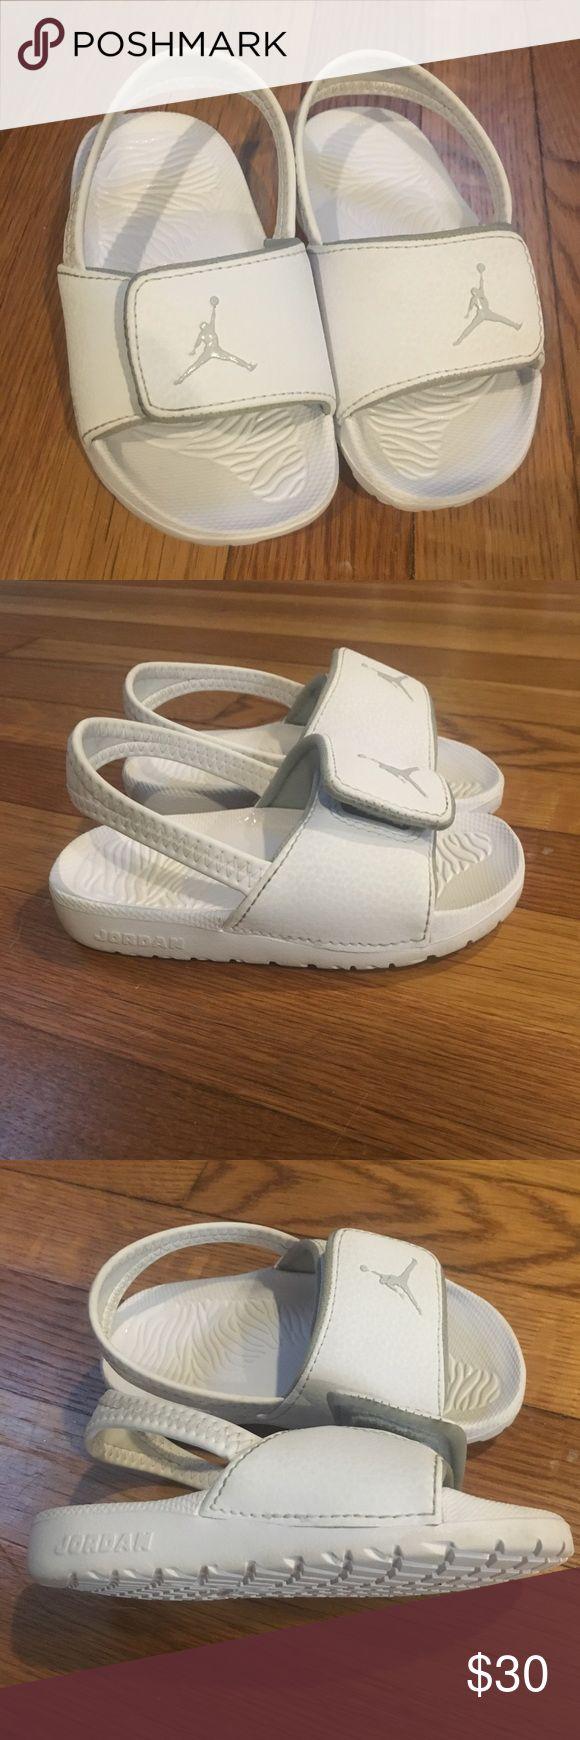 Kids Jordan Scandal White/Gray Jordan Scandal. Boy Size 9C, excellent condition never walked on. Jordan Shoes Sandals & Flip Flops